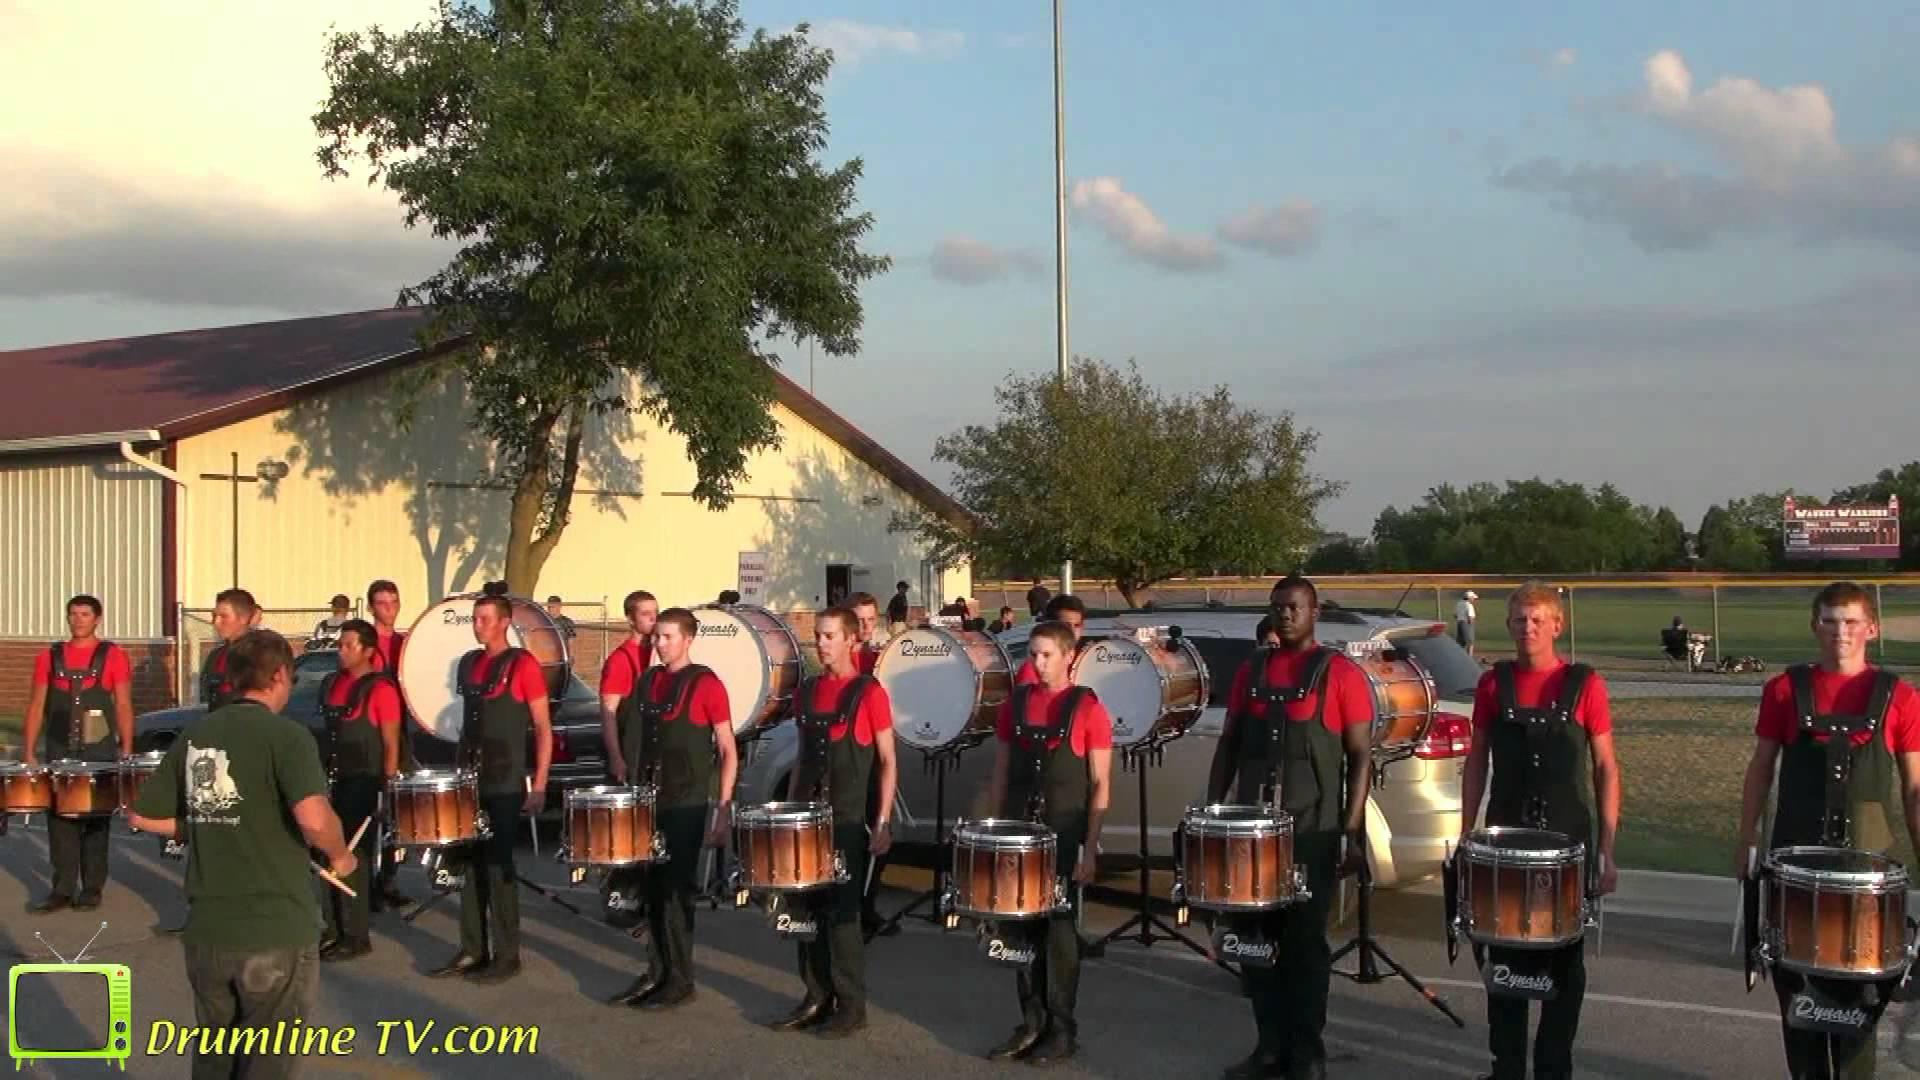 Santa Clara Vanguard 2012 Drumline – Celebration in Brass Show – Waukee, Iowa 7-10-12